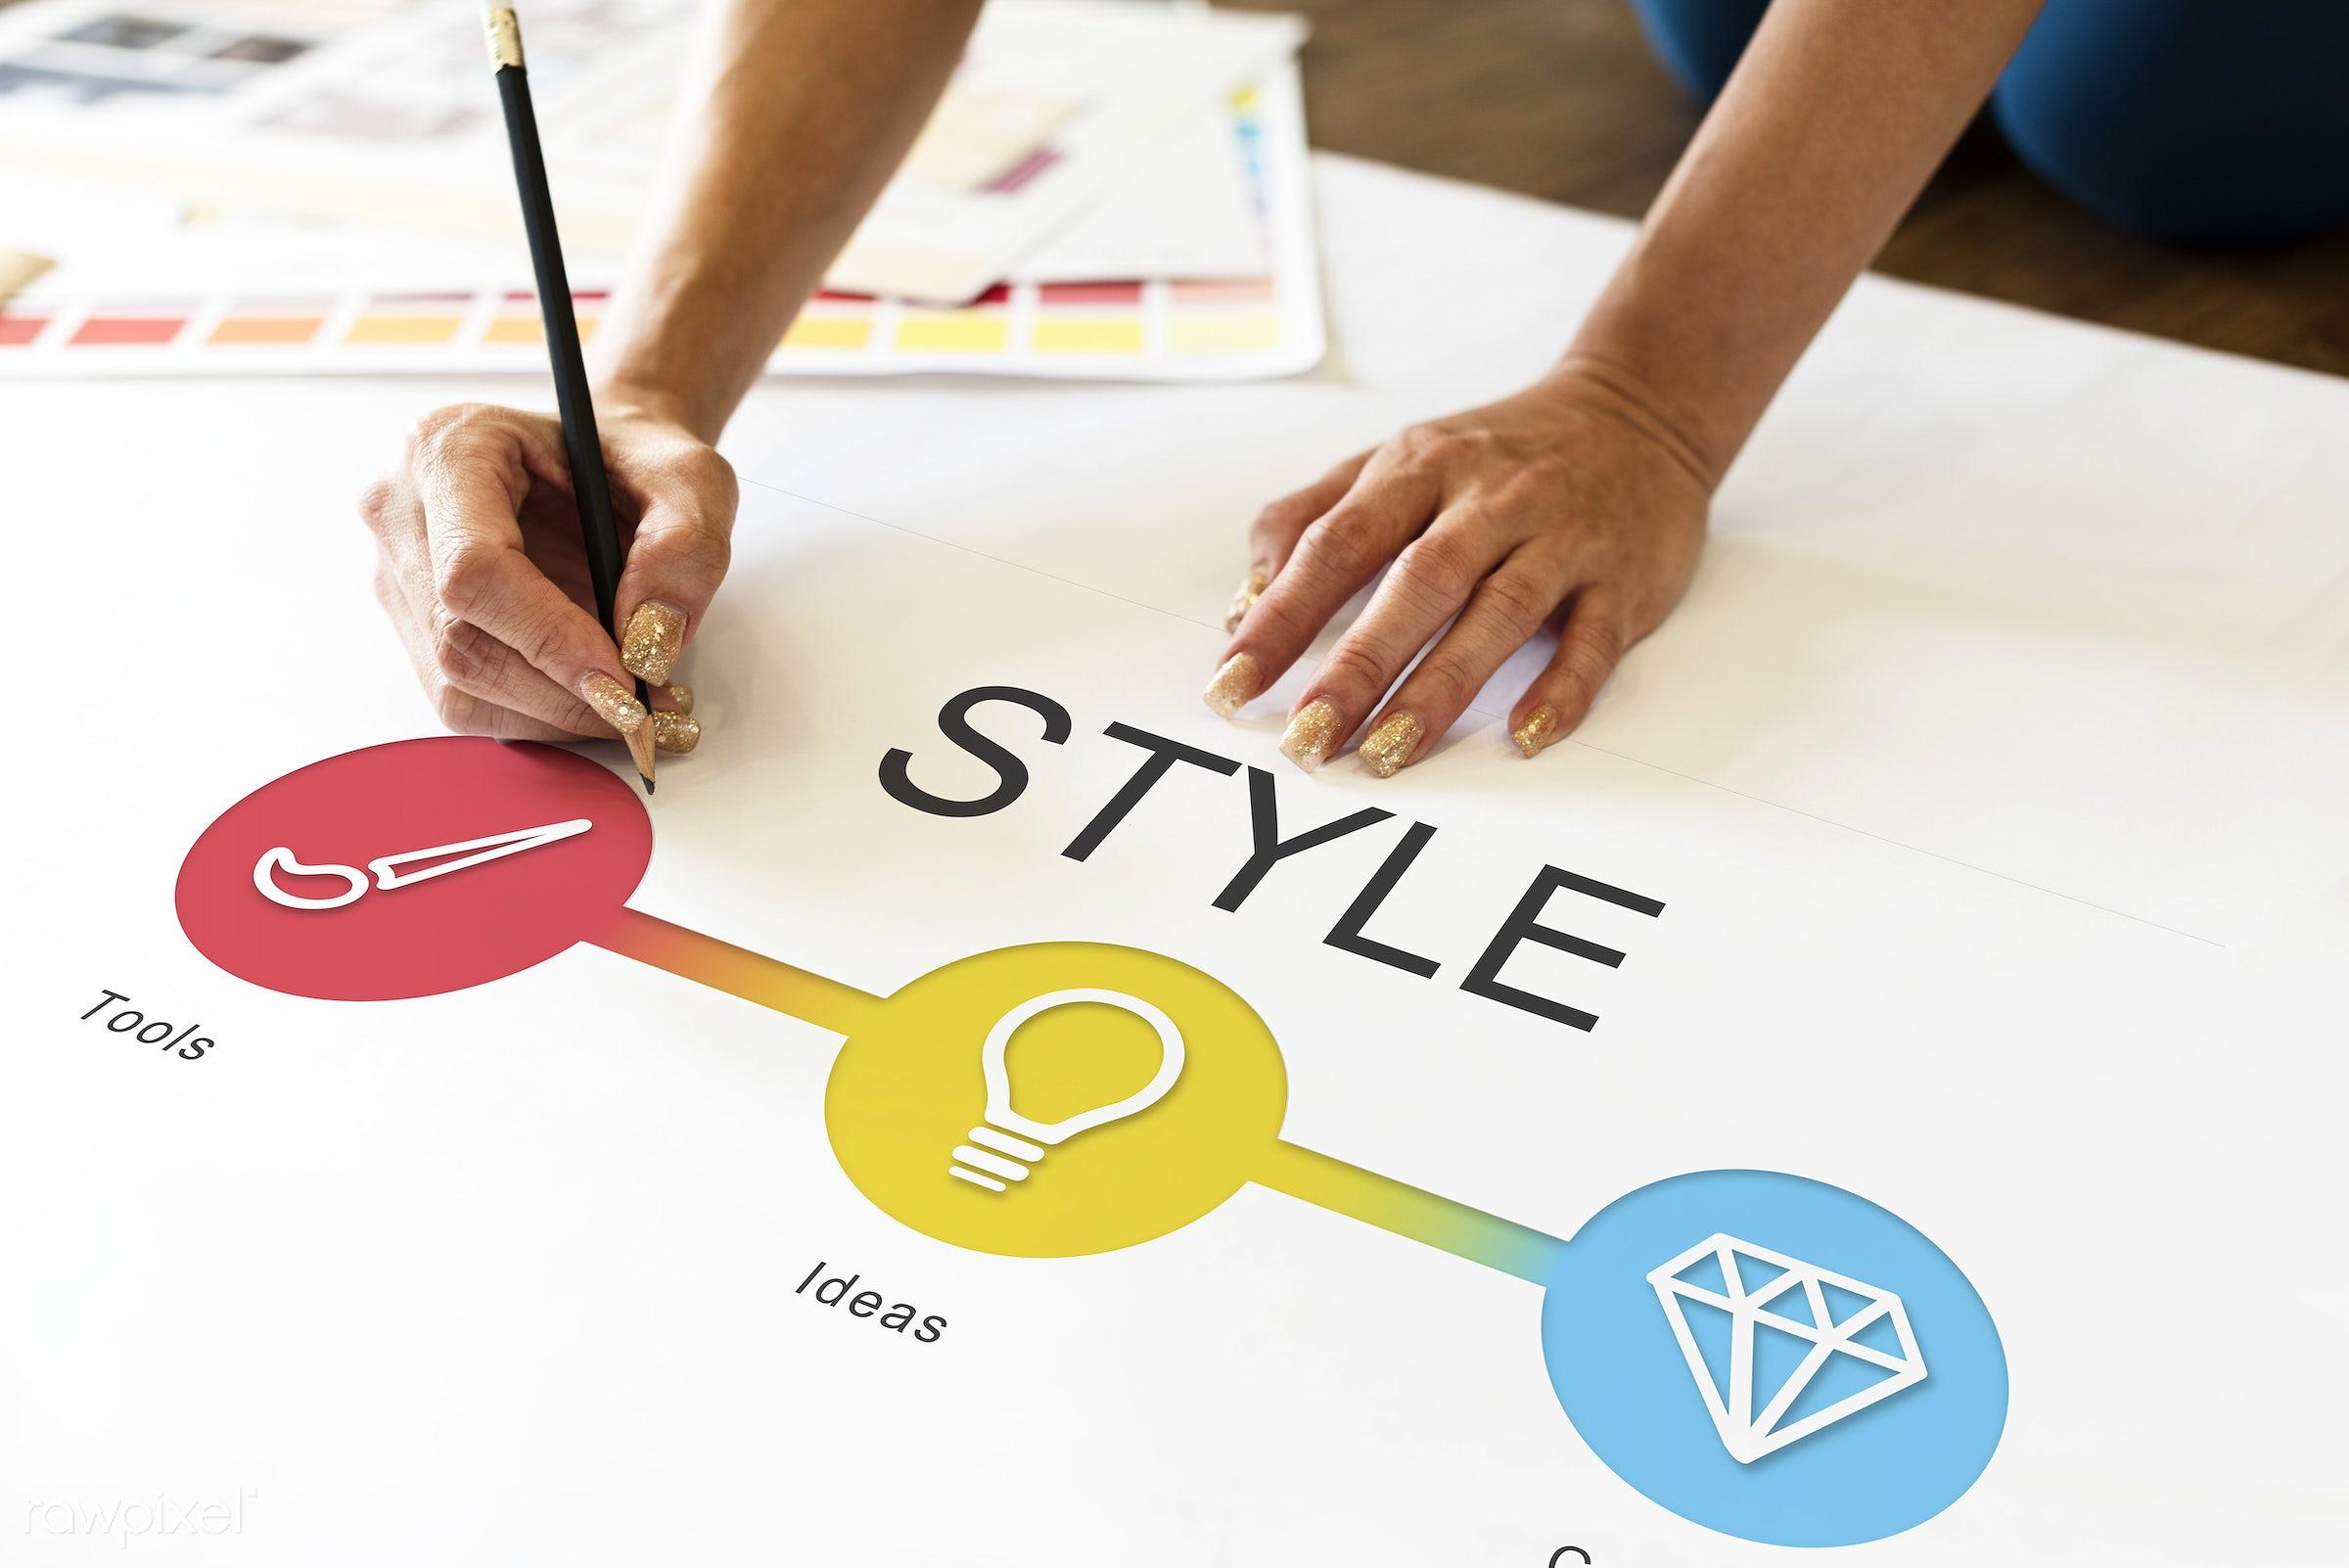 art, composition, configuration, content, creation, creative, creativity, design, develop, diagram, digital, drawing, hands...